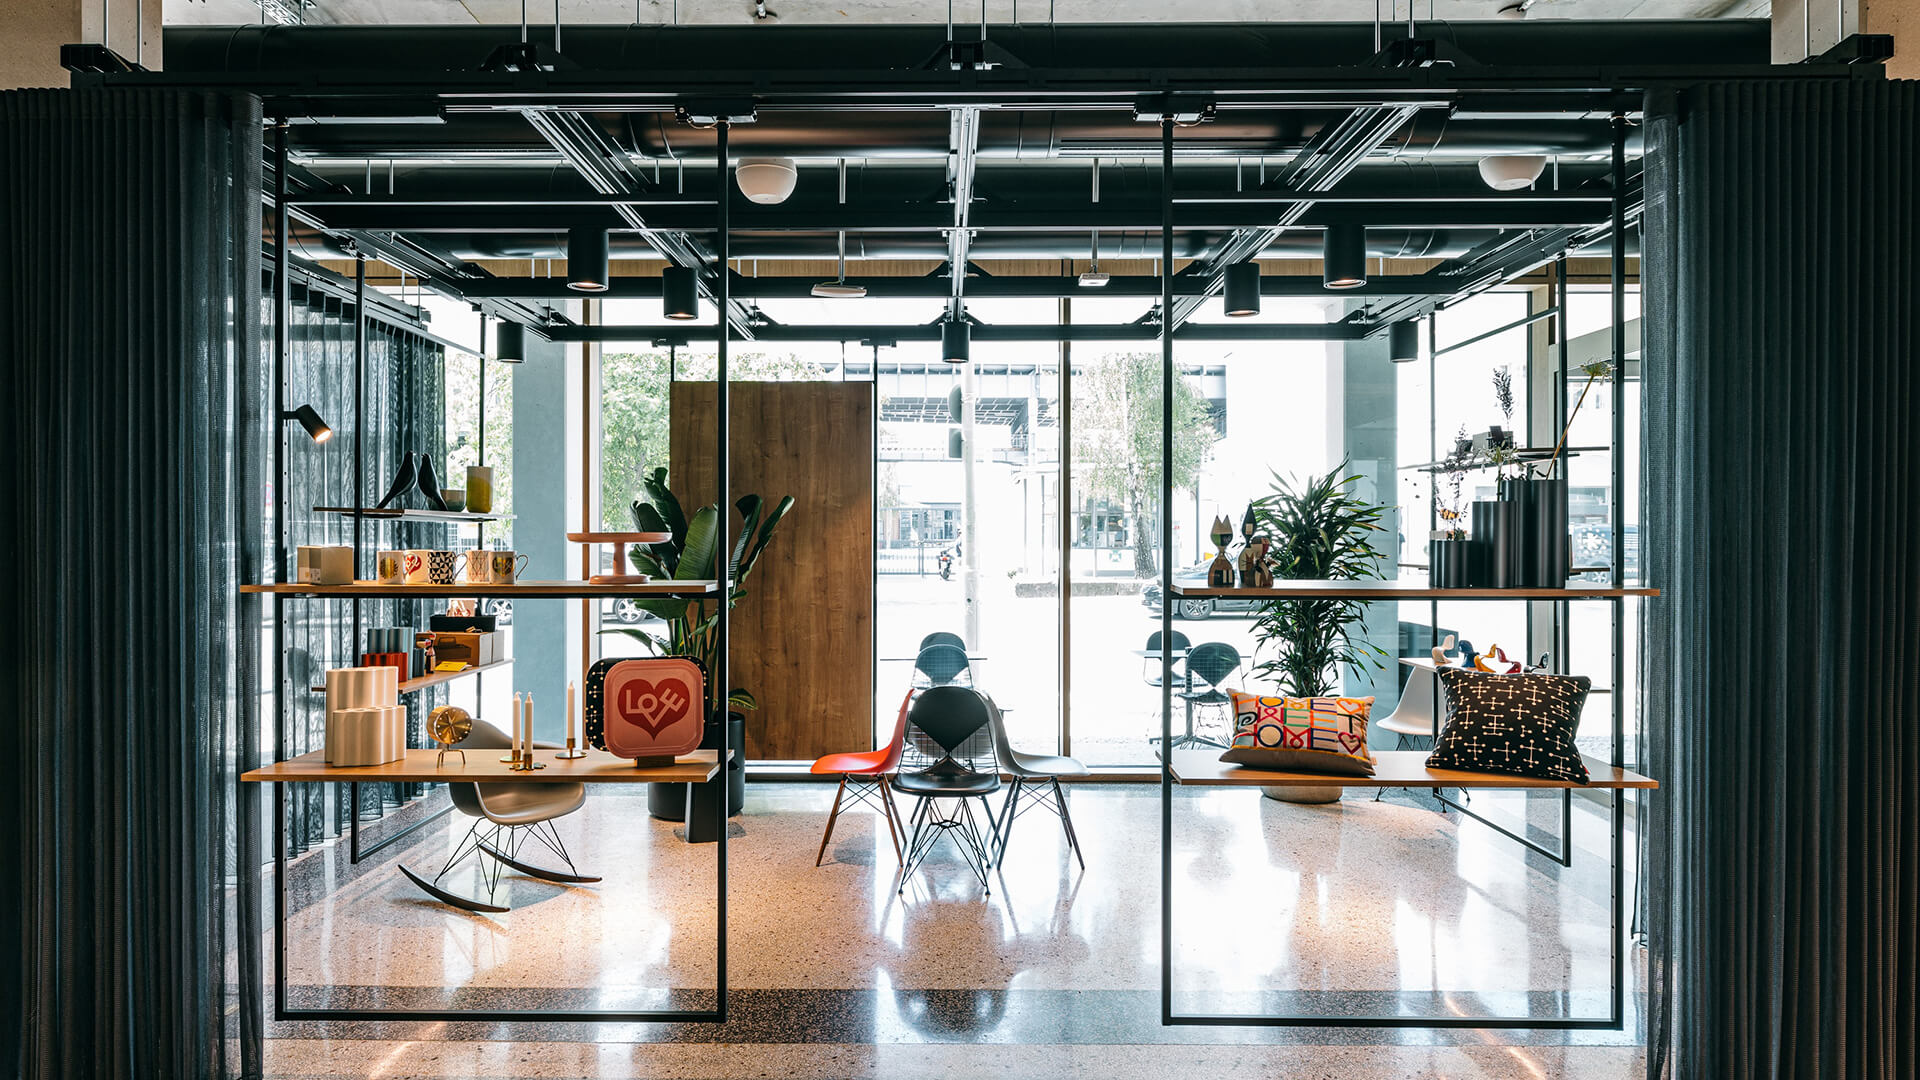 Schlegel Concepts Hotel Aletto Berlin